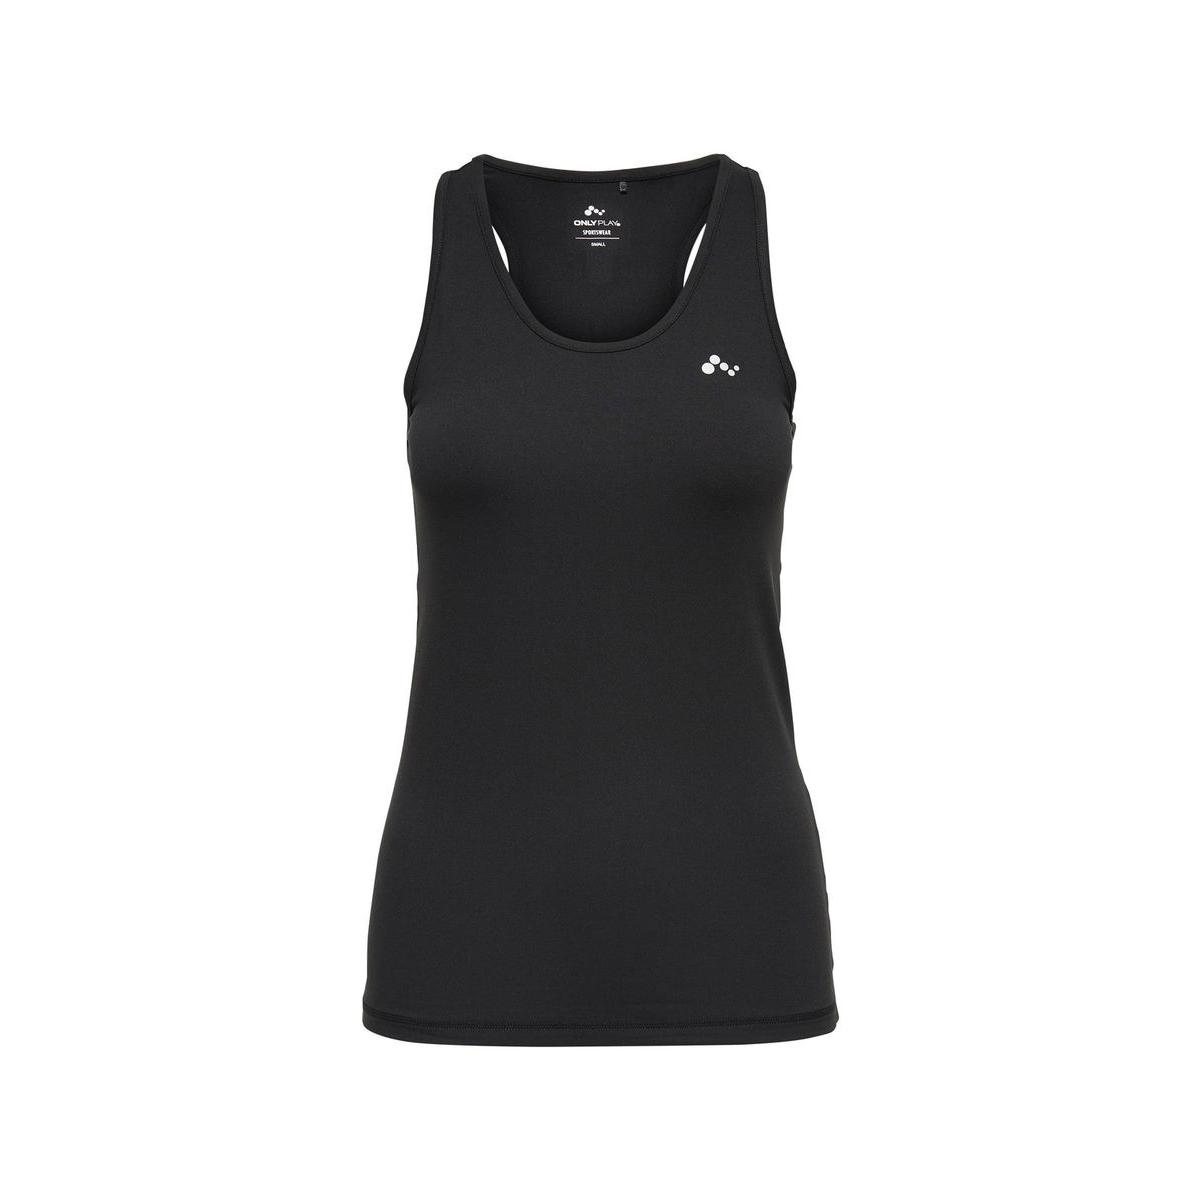 onpclarissa sl training tee - opus 15135152 only play sport top black